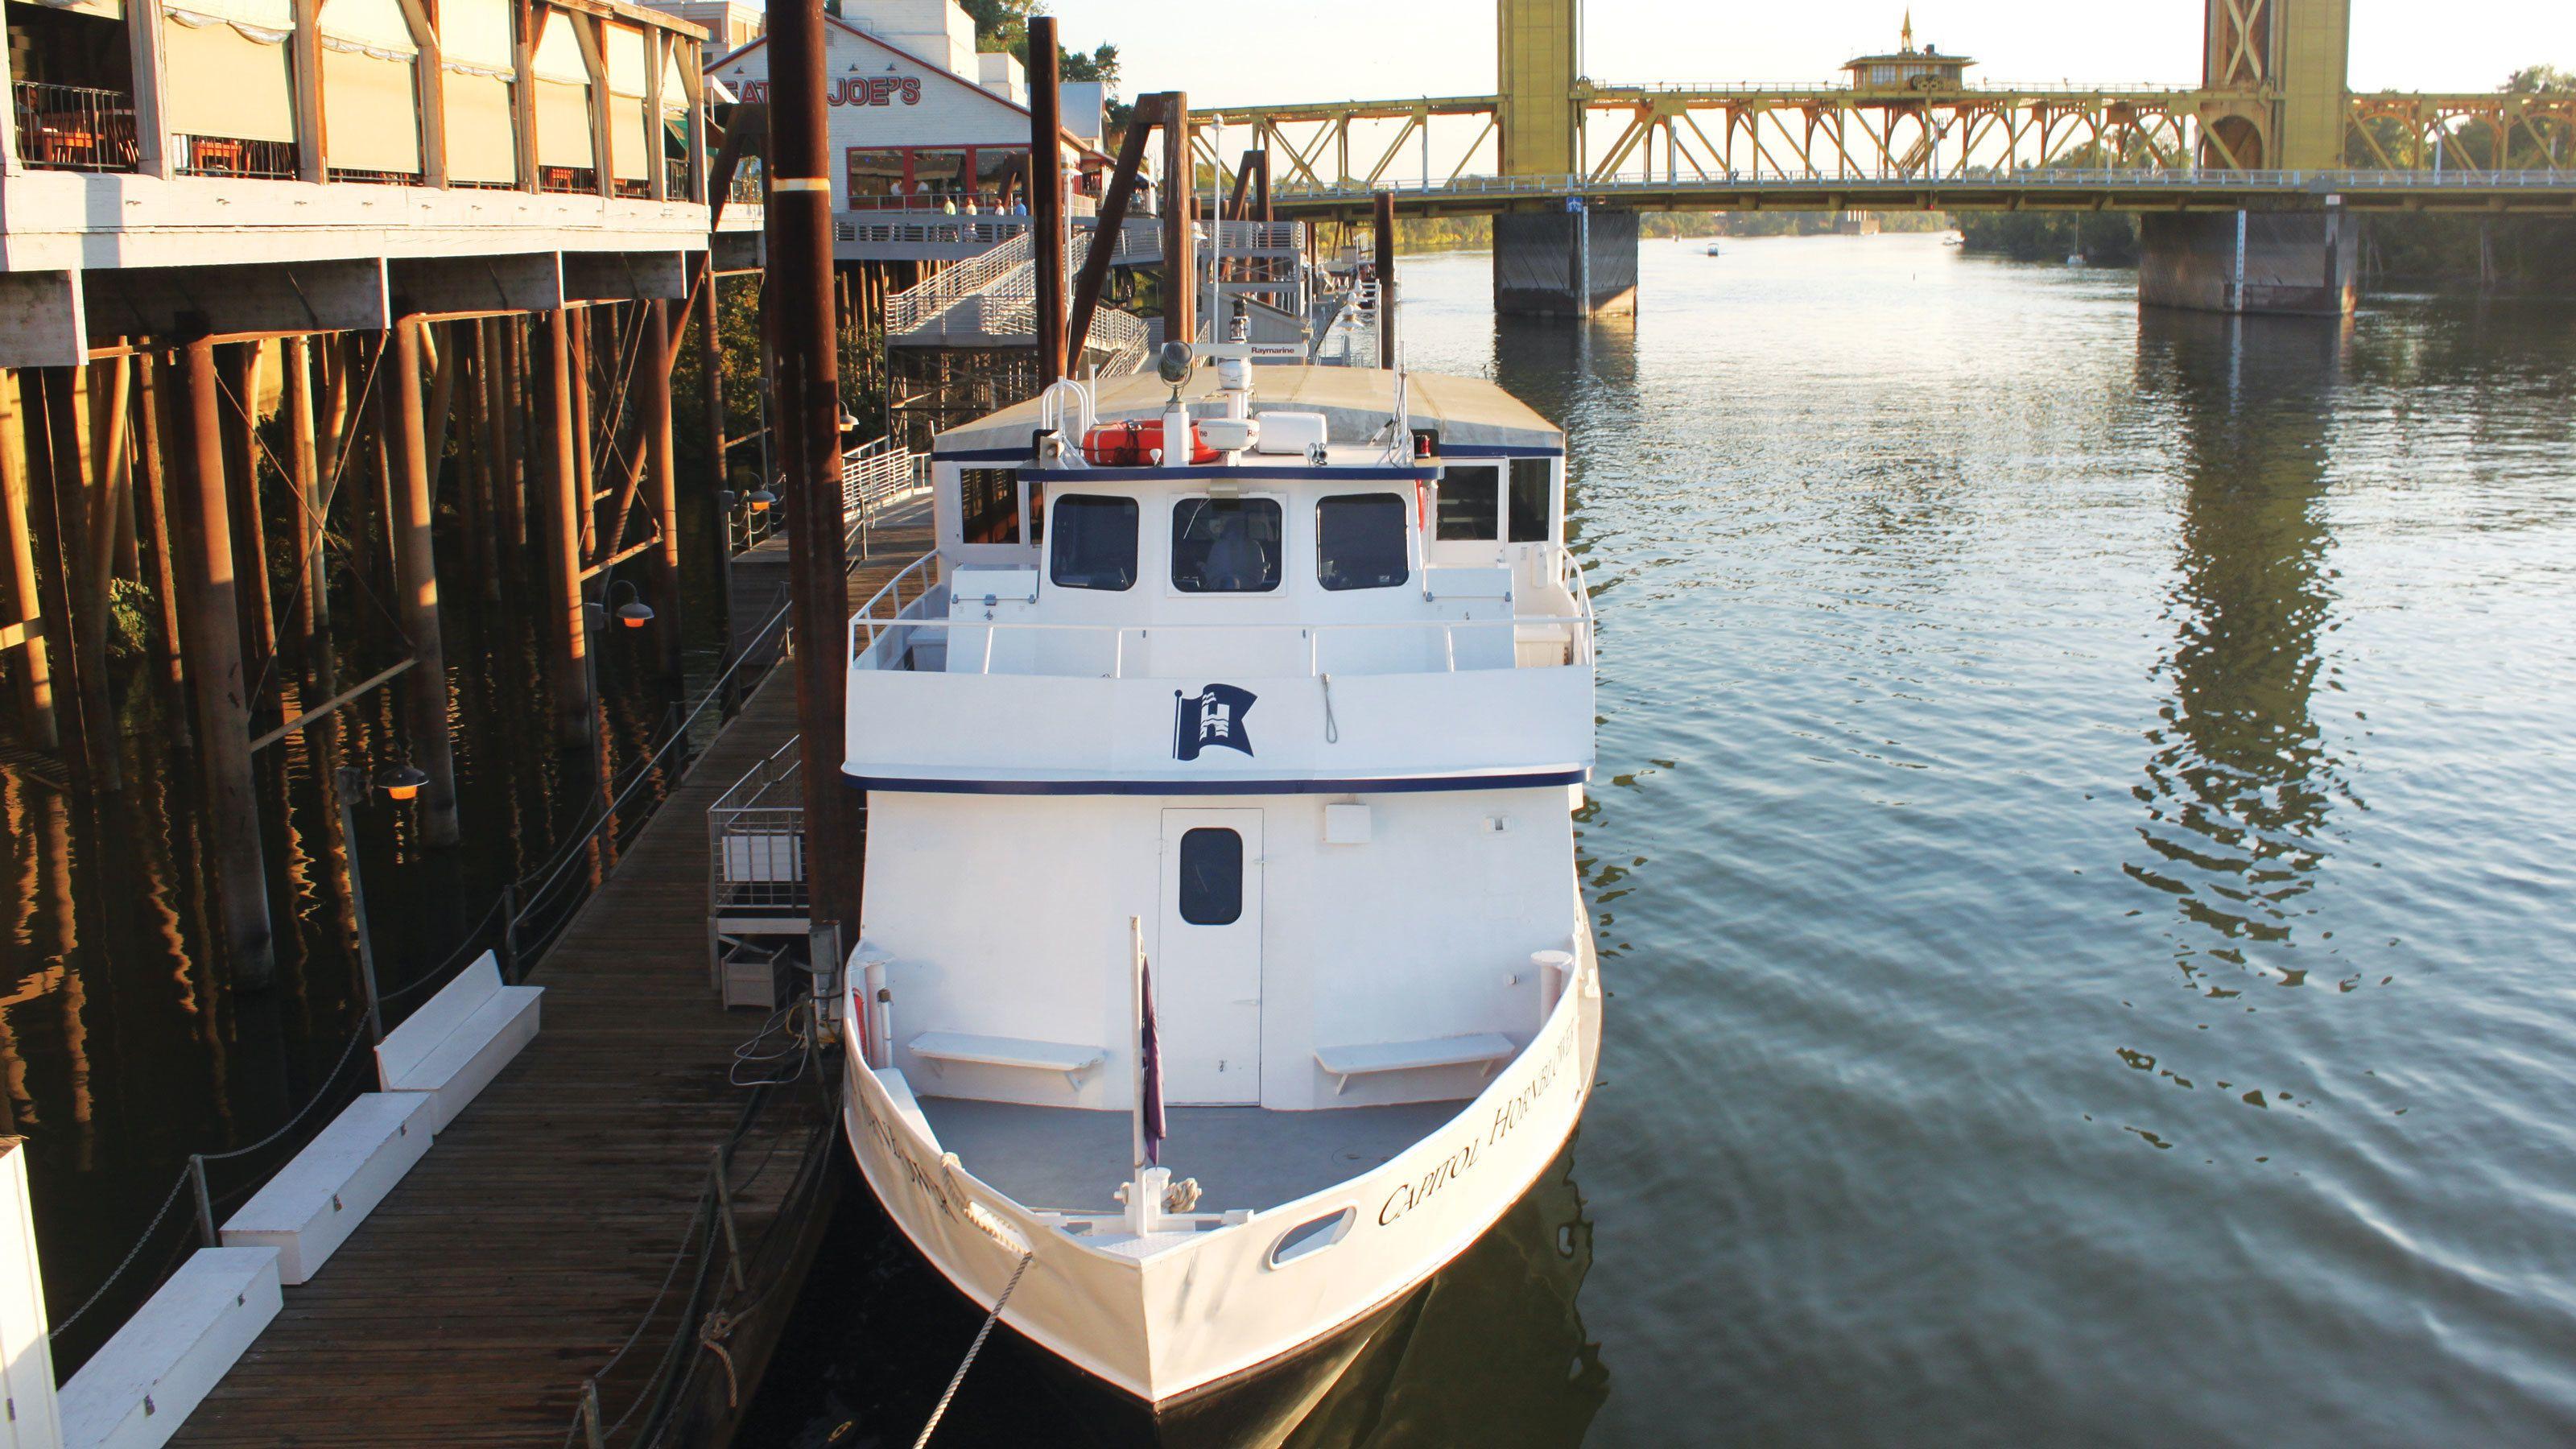 Historic River Cruise on the Sacramento River